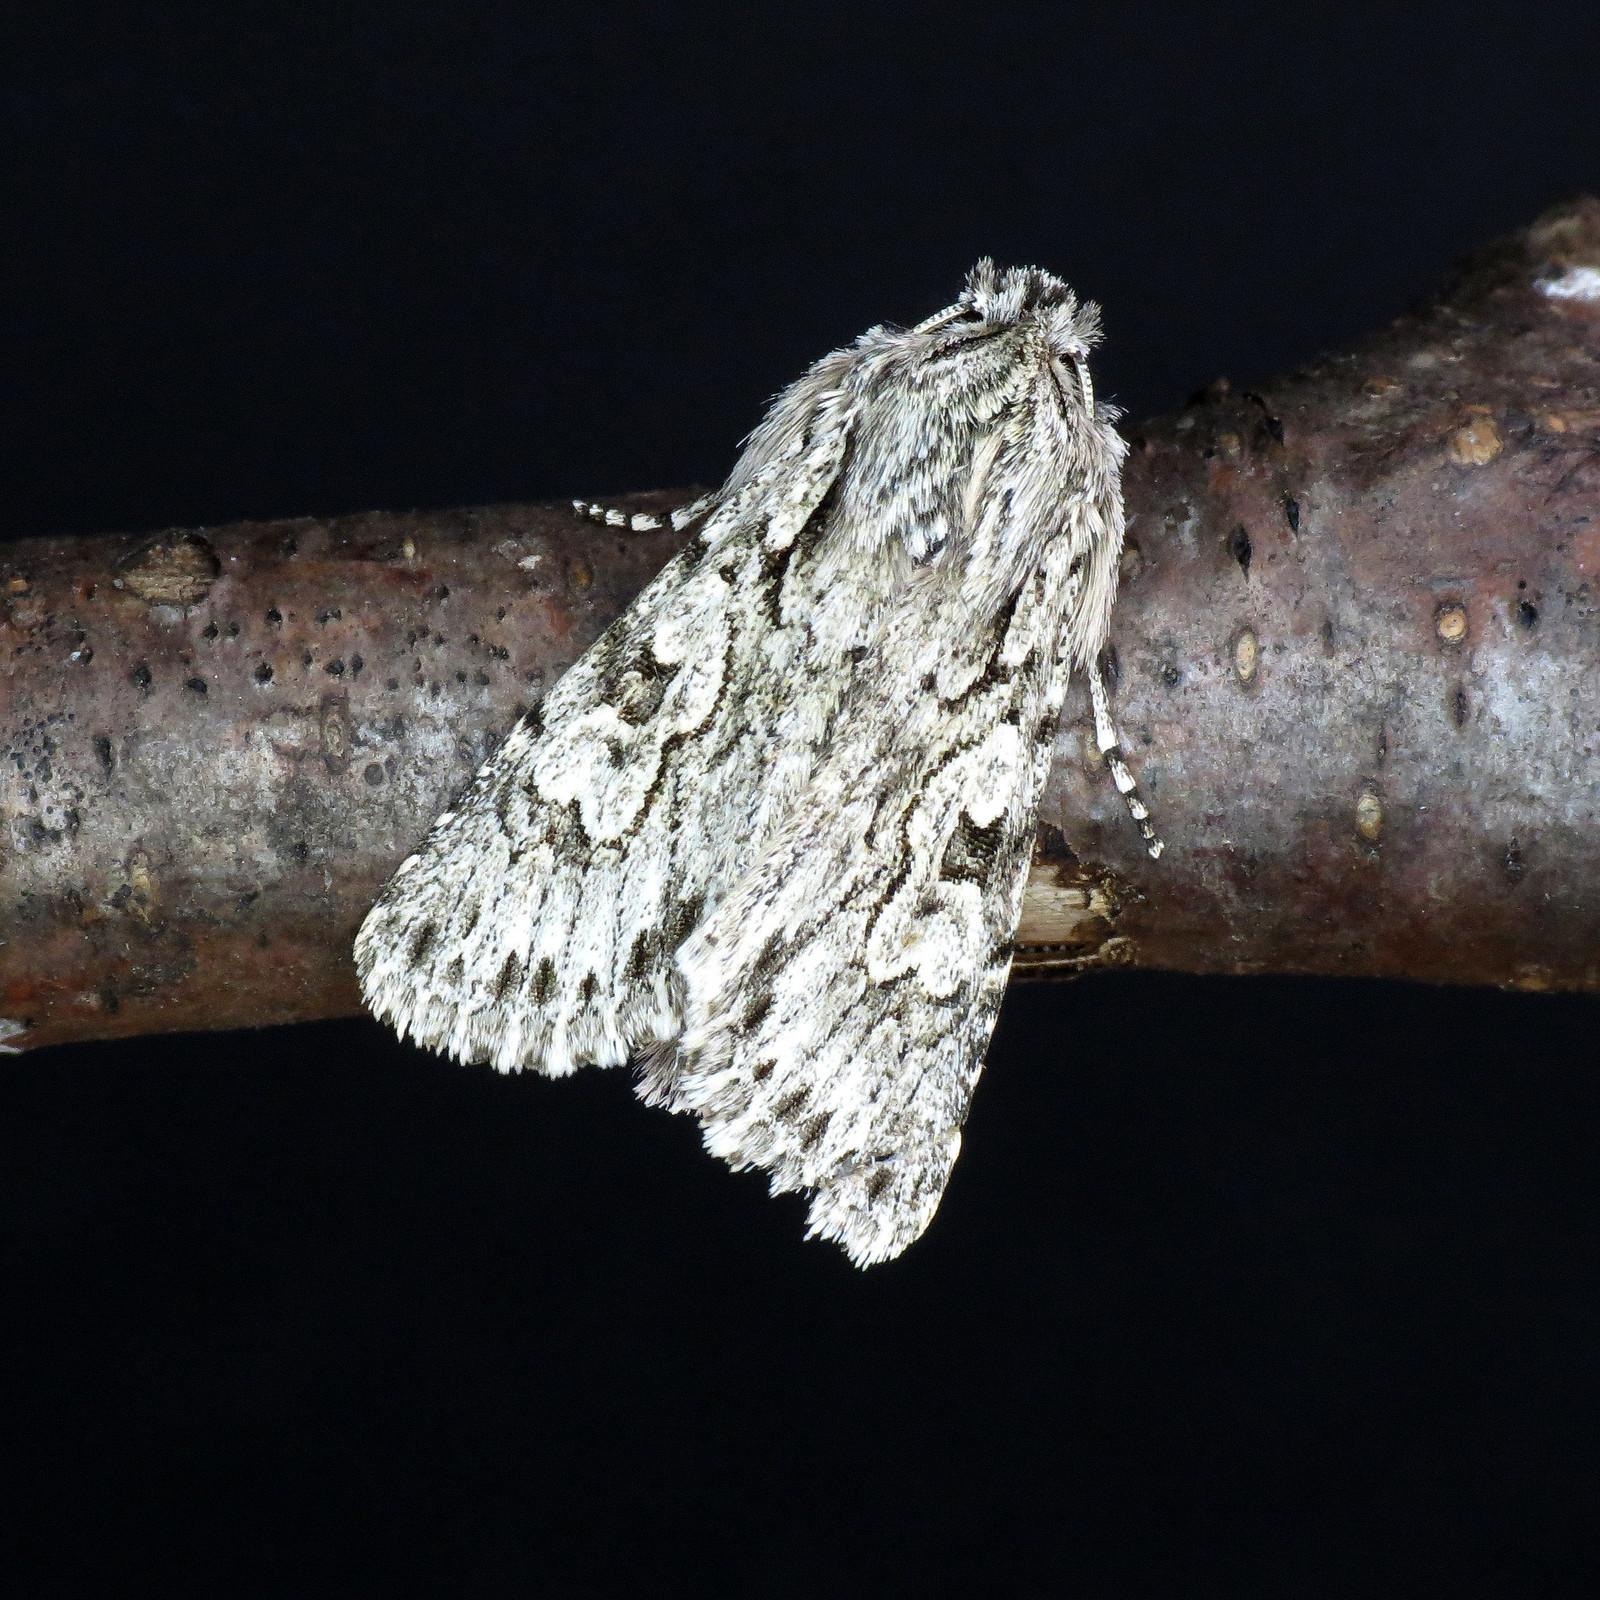 2243 Early Grey - Xylocampa areola